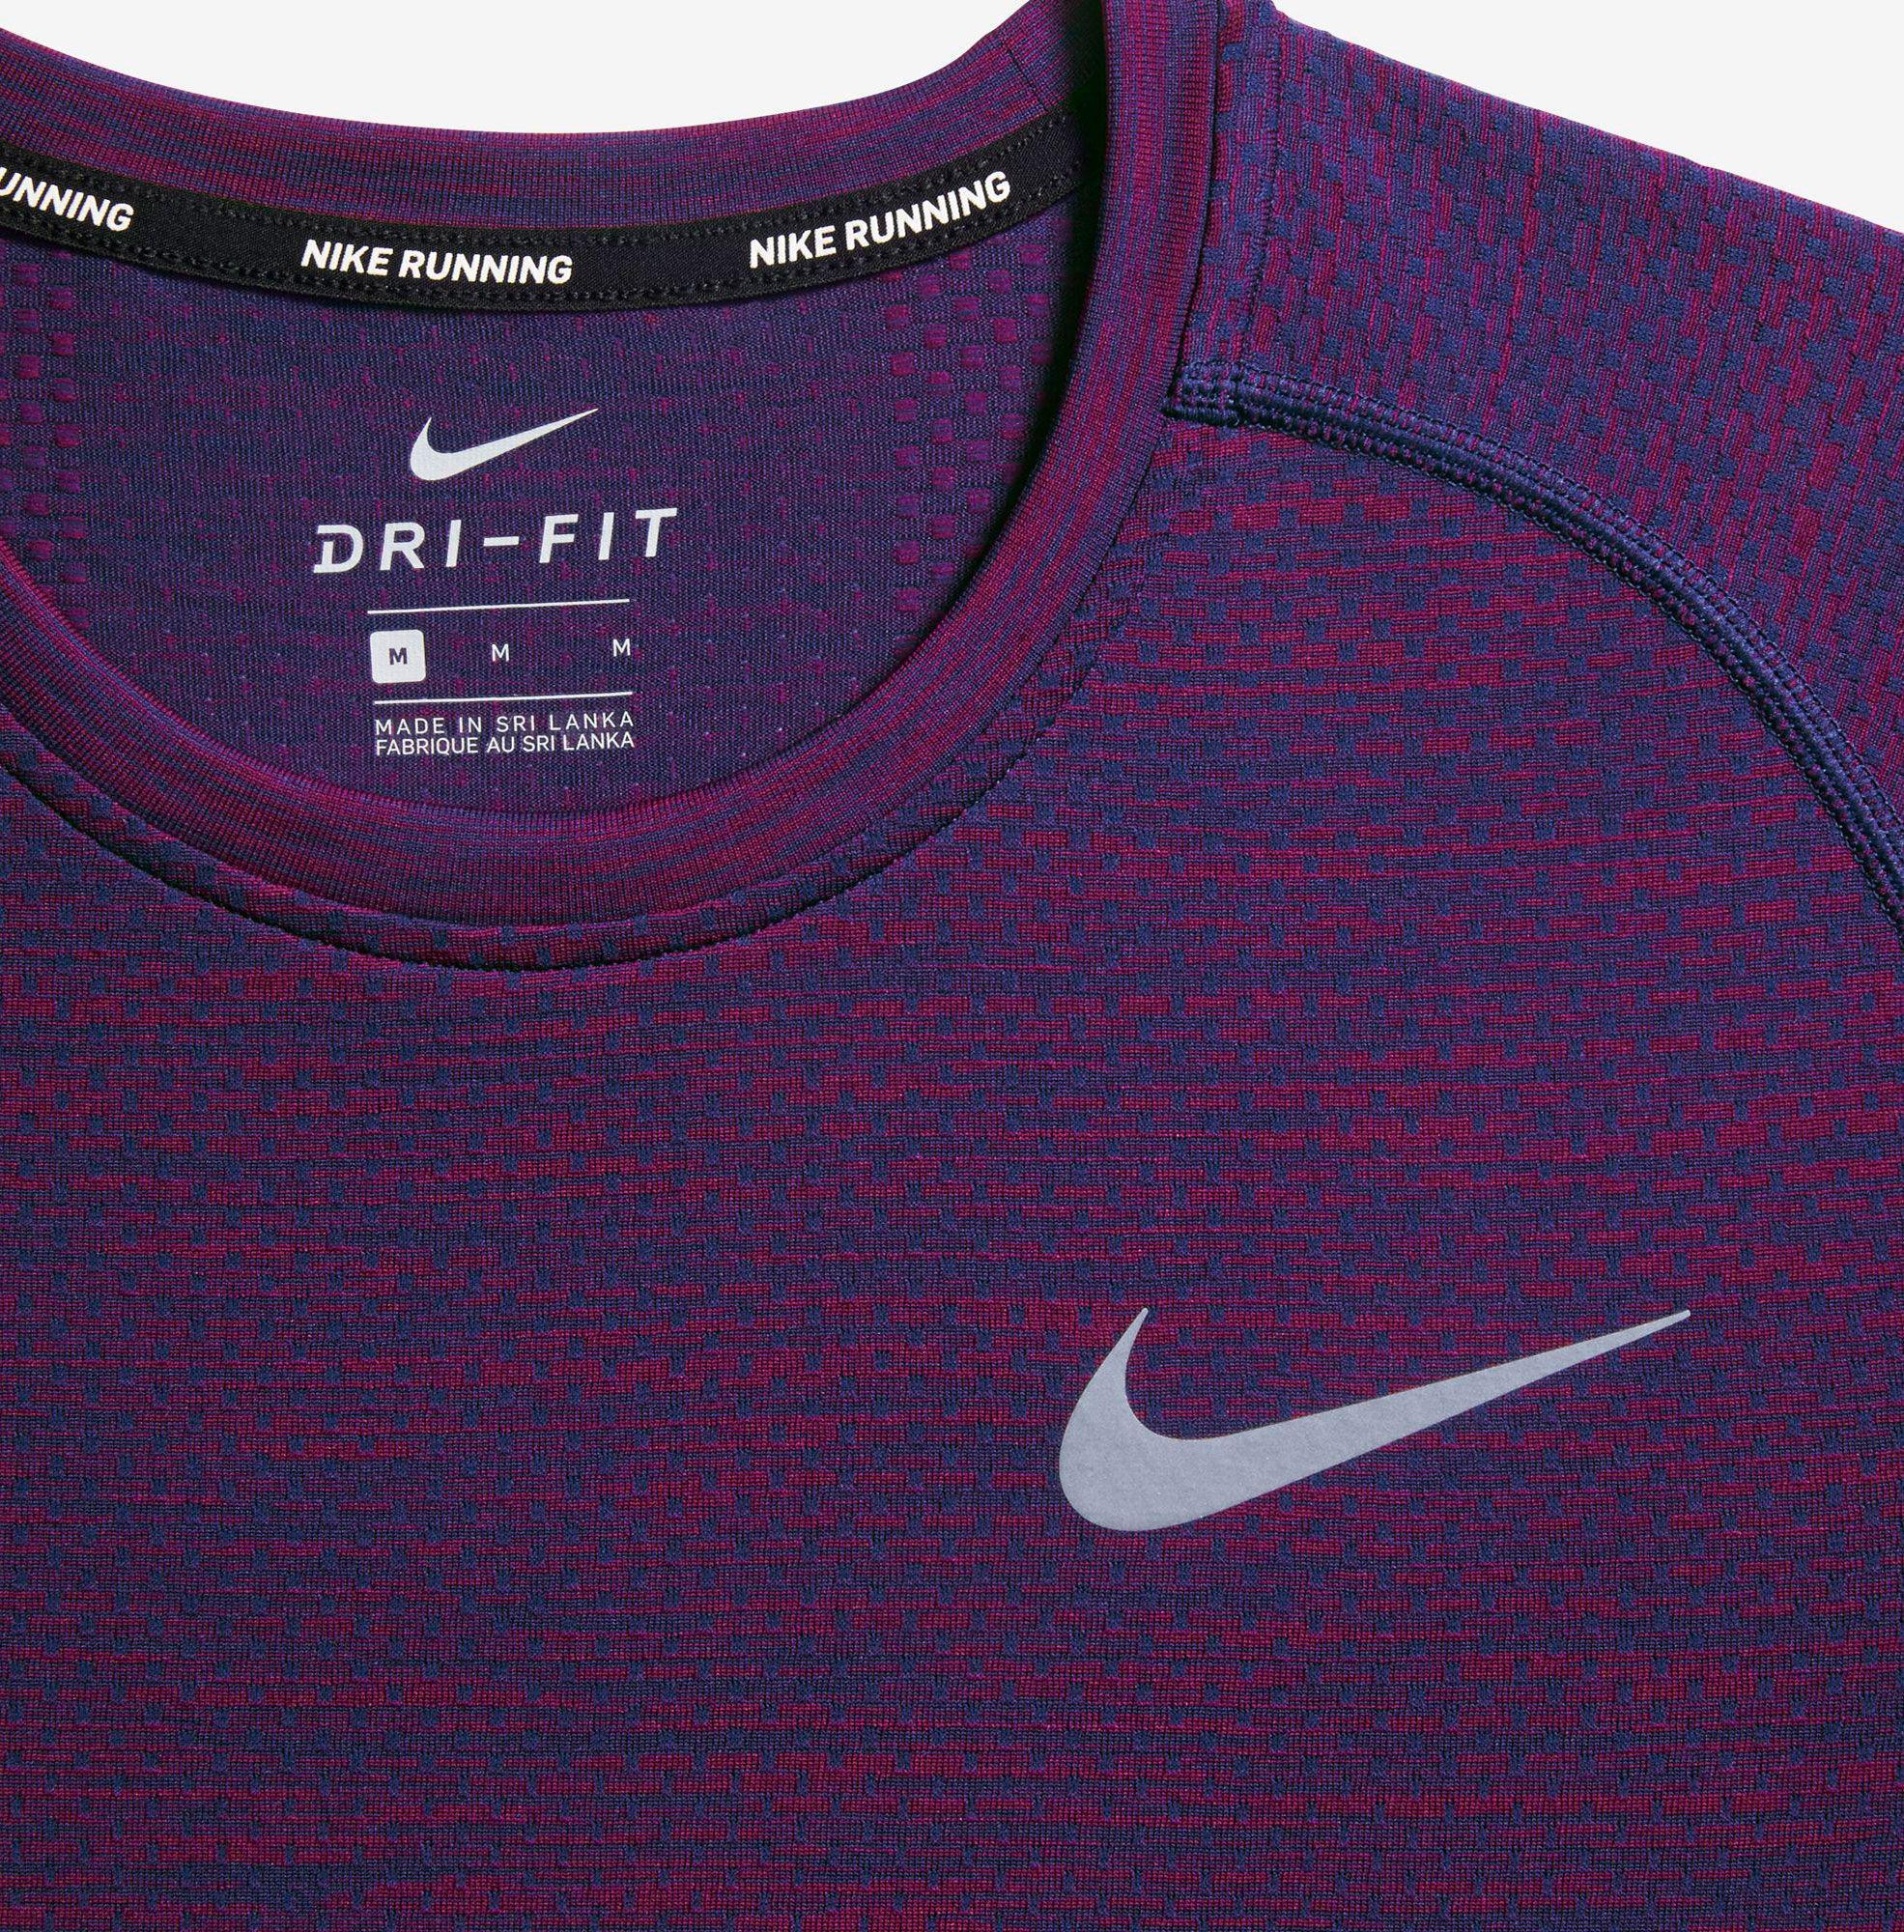 96f150c2b Nike Dri Fit Knitted Short Sleeved T Shirt Mens - DREAMWORKS